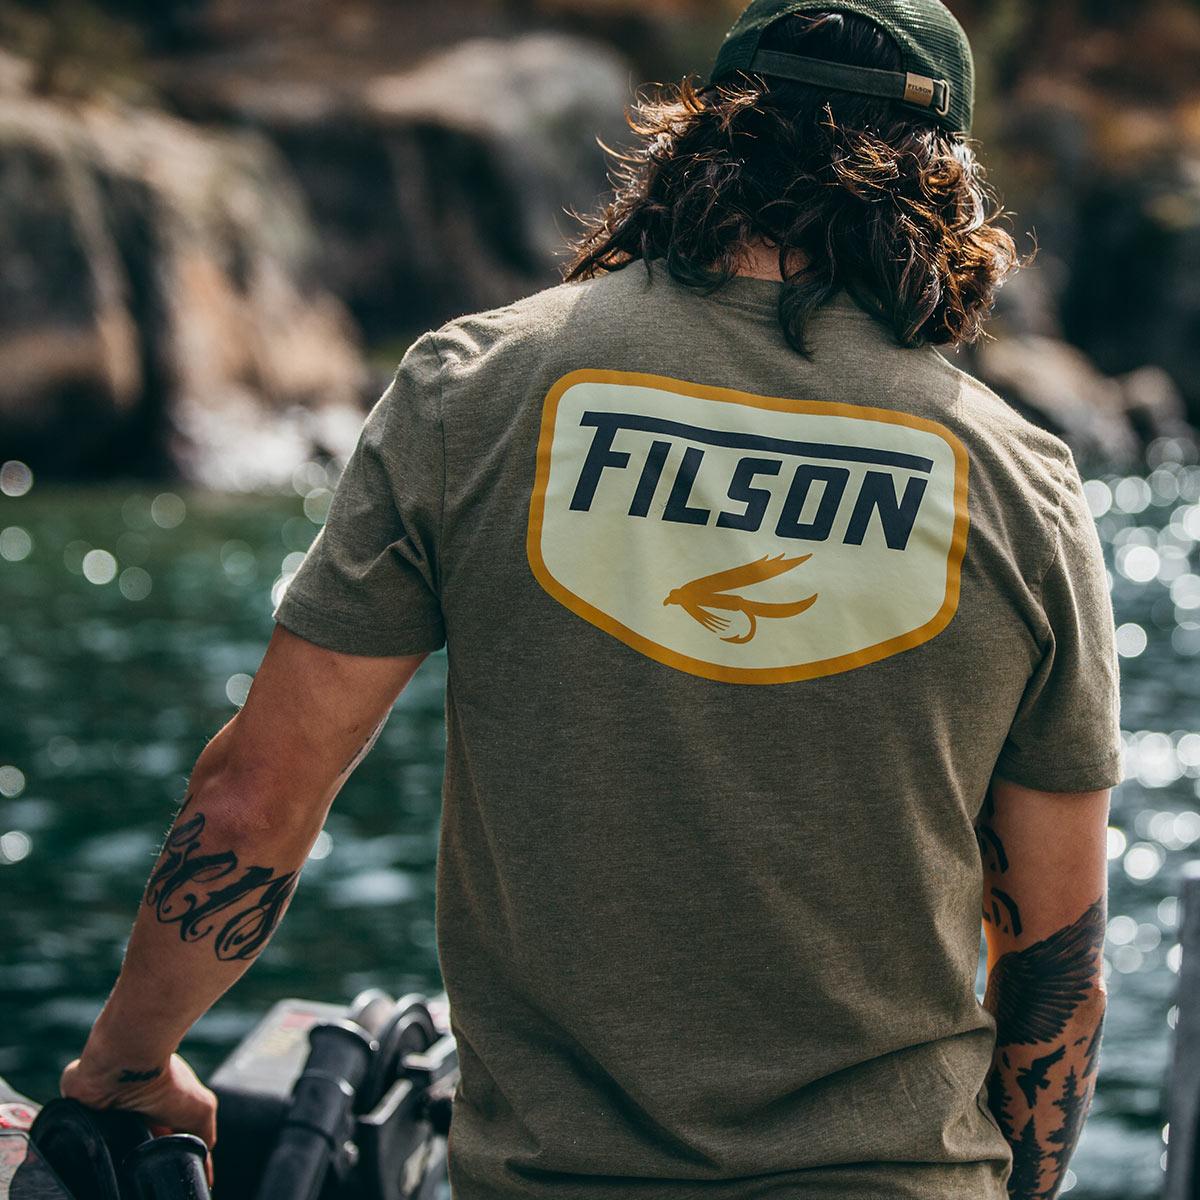 Filson Buckshot T-Shirt Olive Drab Heather, with custom graphics designed in-house at Filson